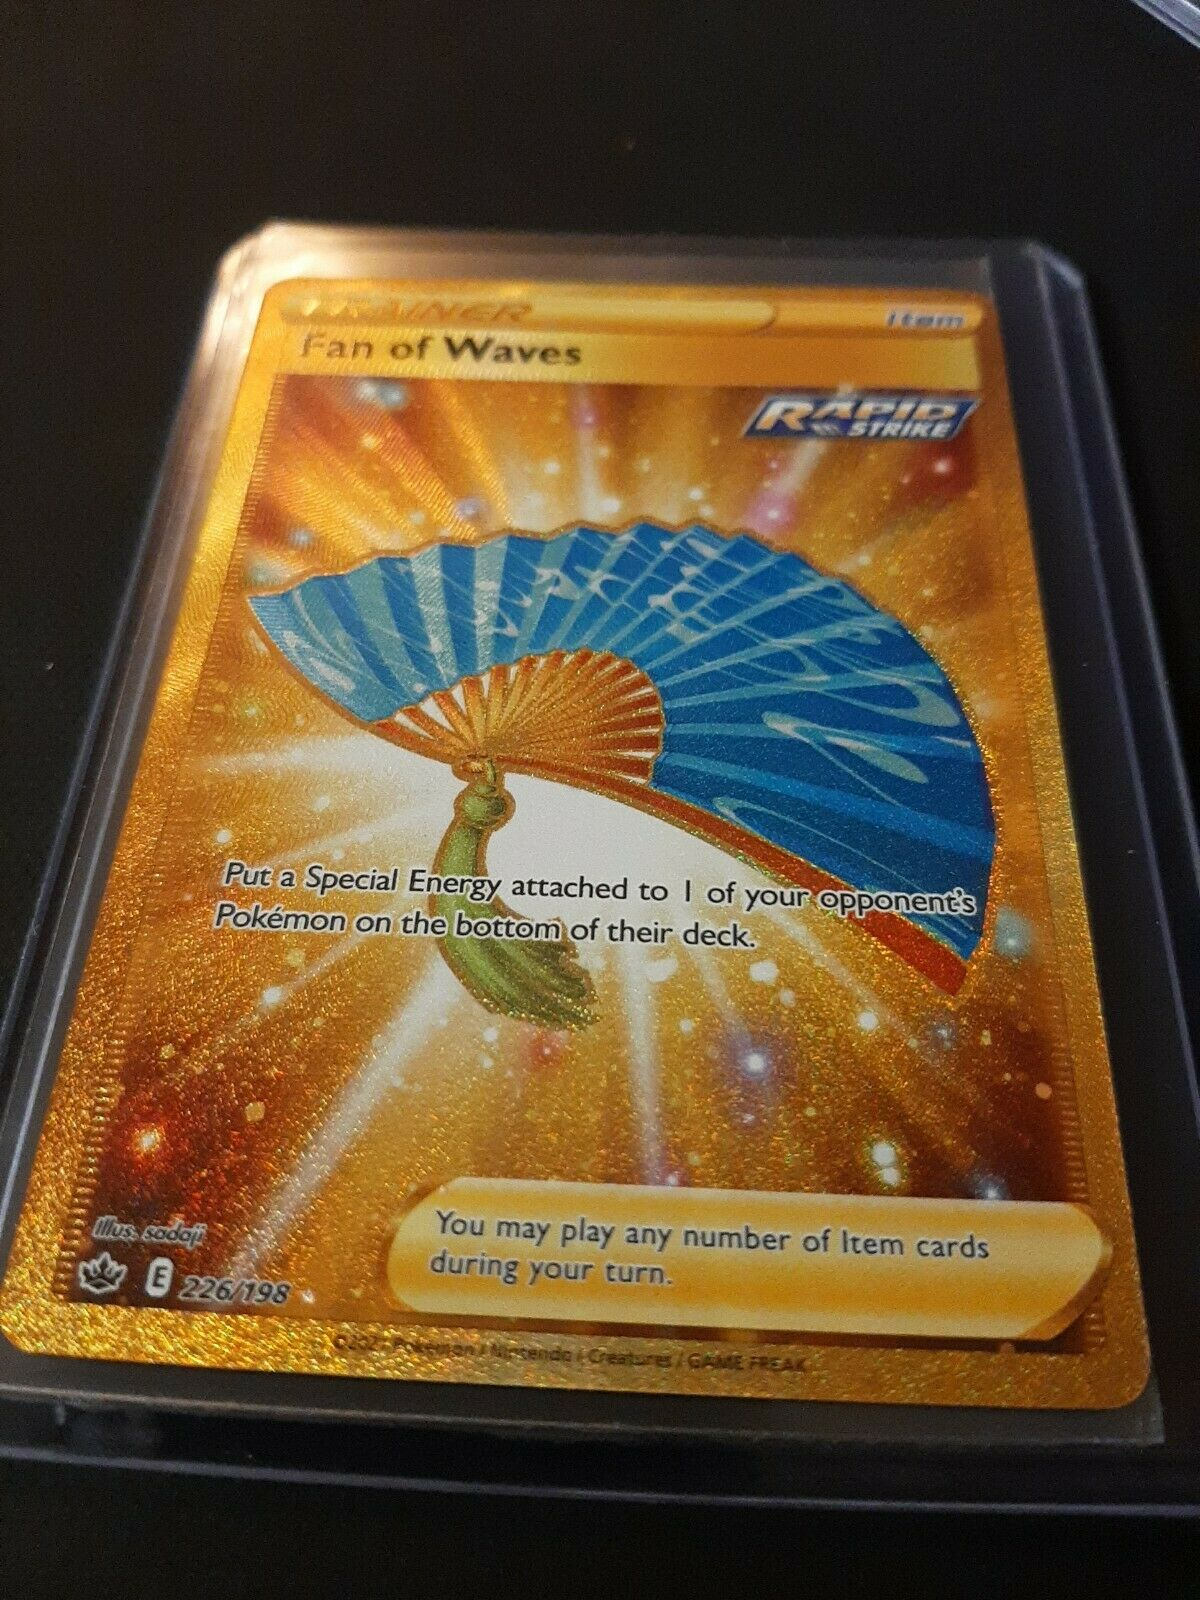 🌟Fan of Waves 226/198 Gold Rare Chilling Reign Pokemon Card Mint/Near Mint🌠